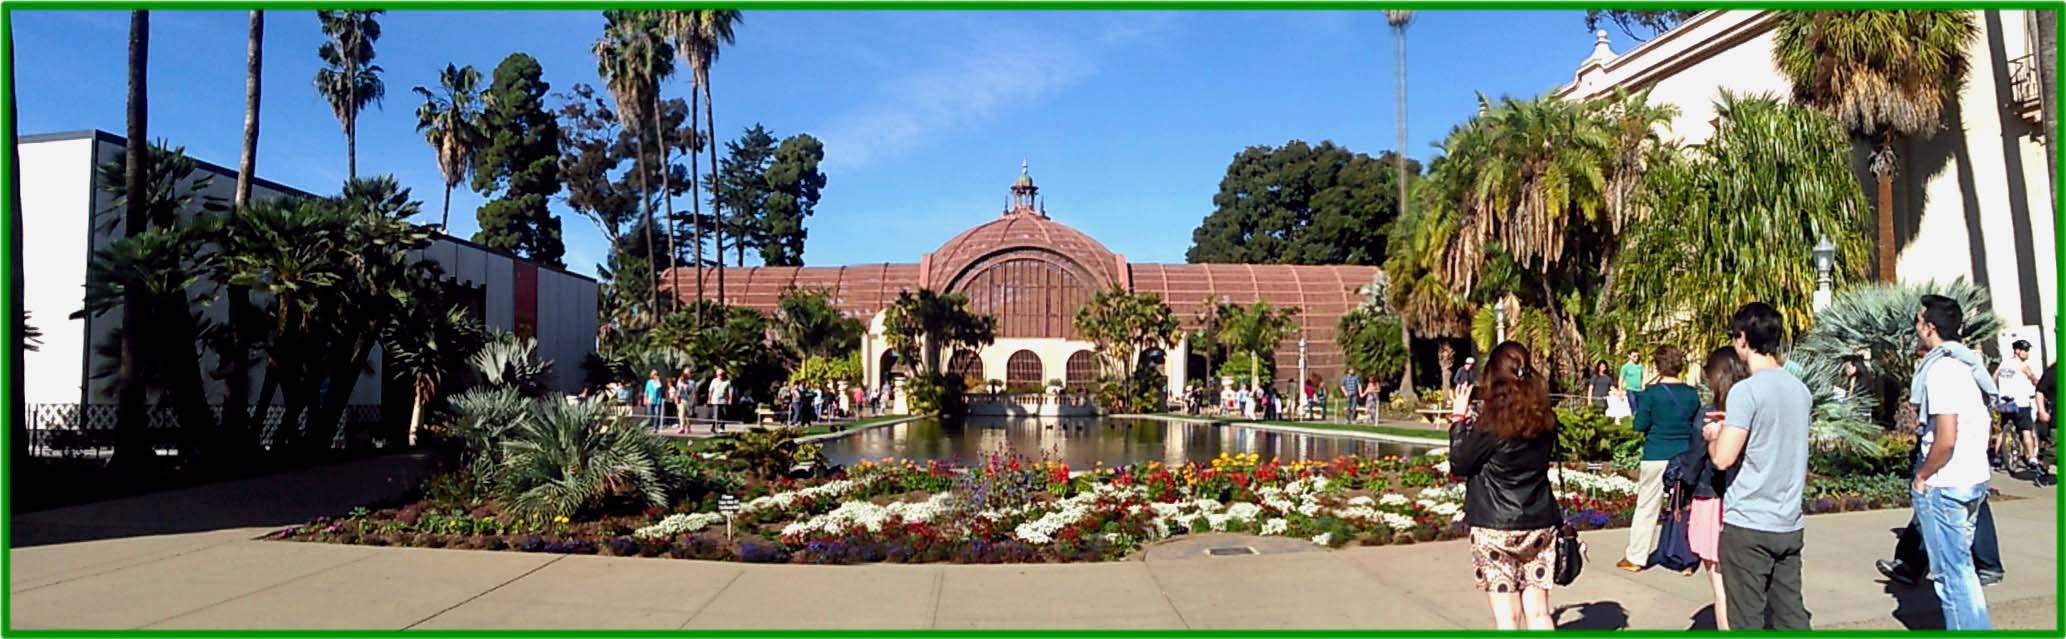 Balboa Park Botanical Garden And Pond